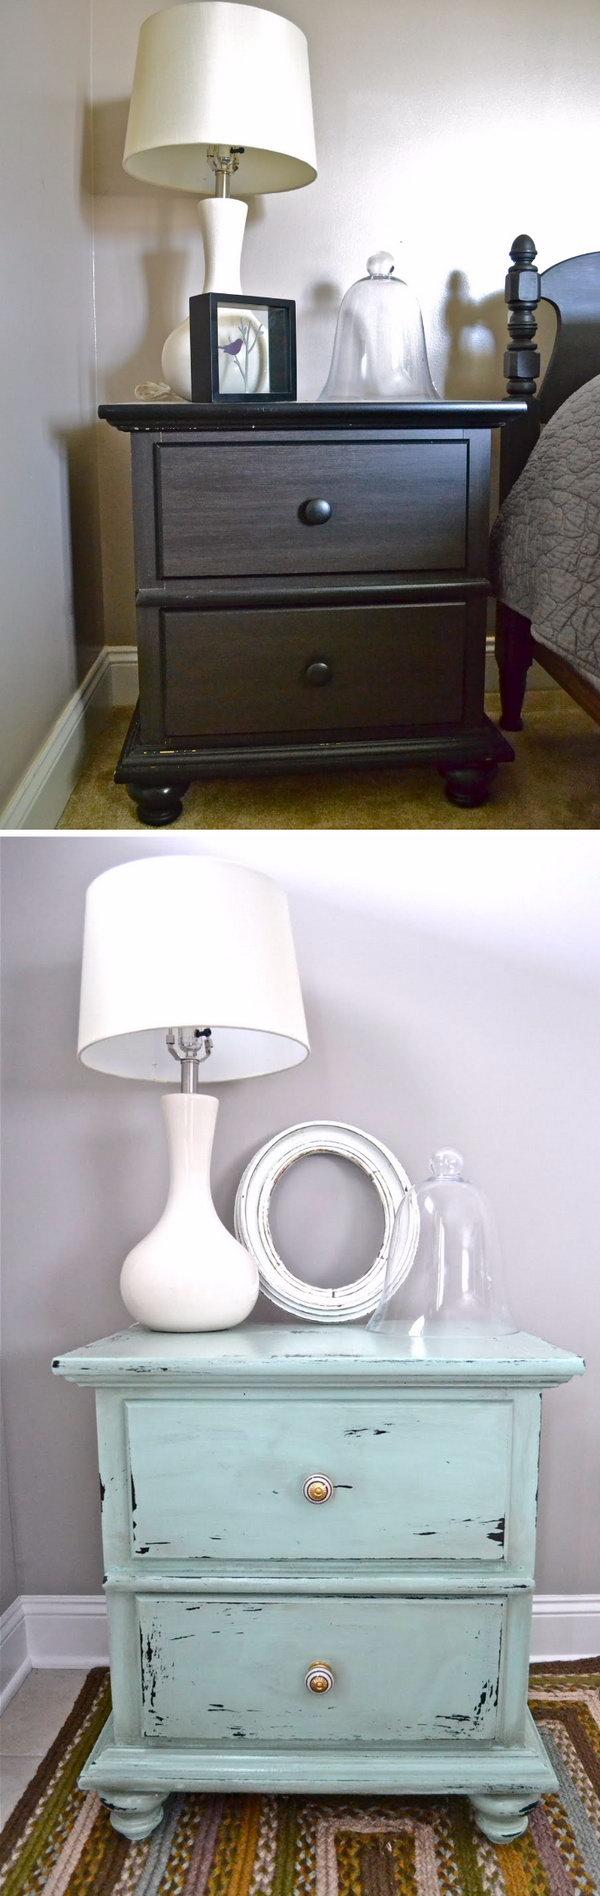 Diy shabby chic furniture - Shabby Chic Nightstand Makeover